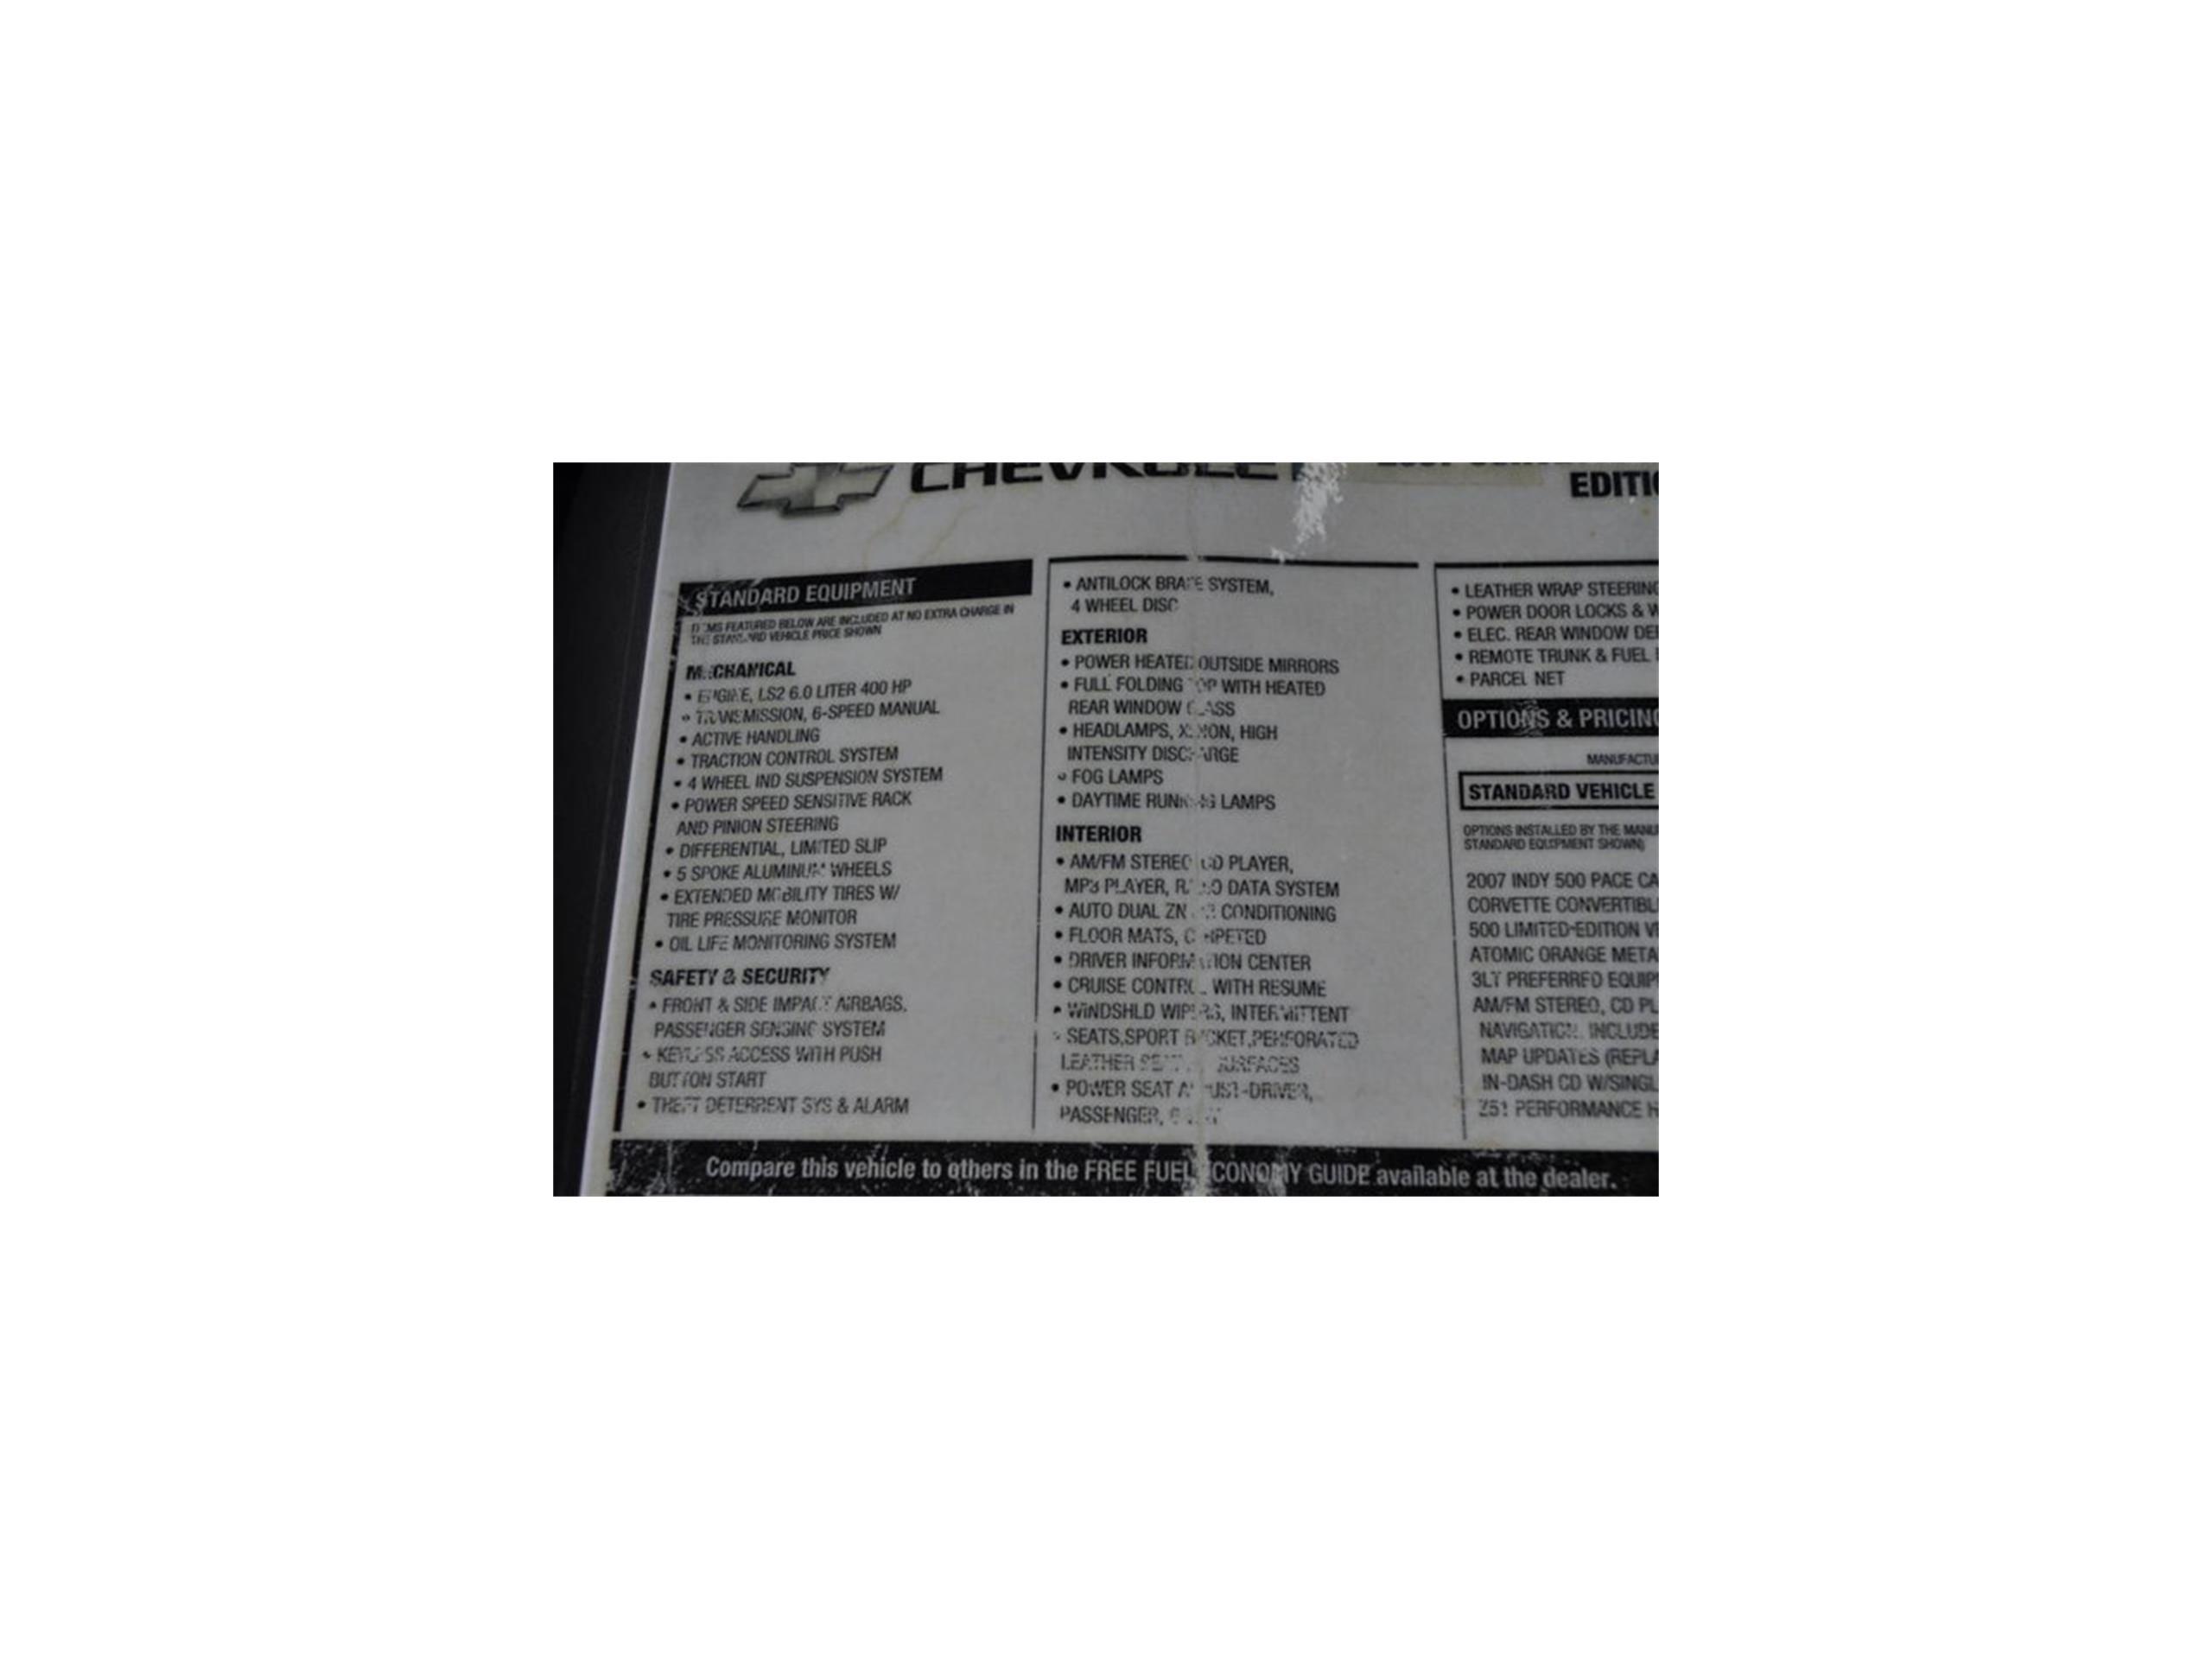 mobiity speed 500 manual